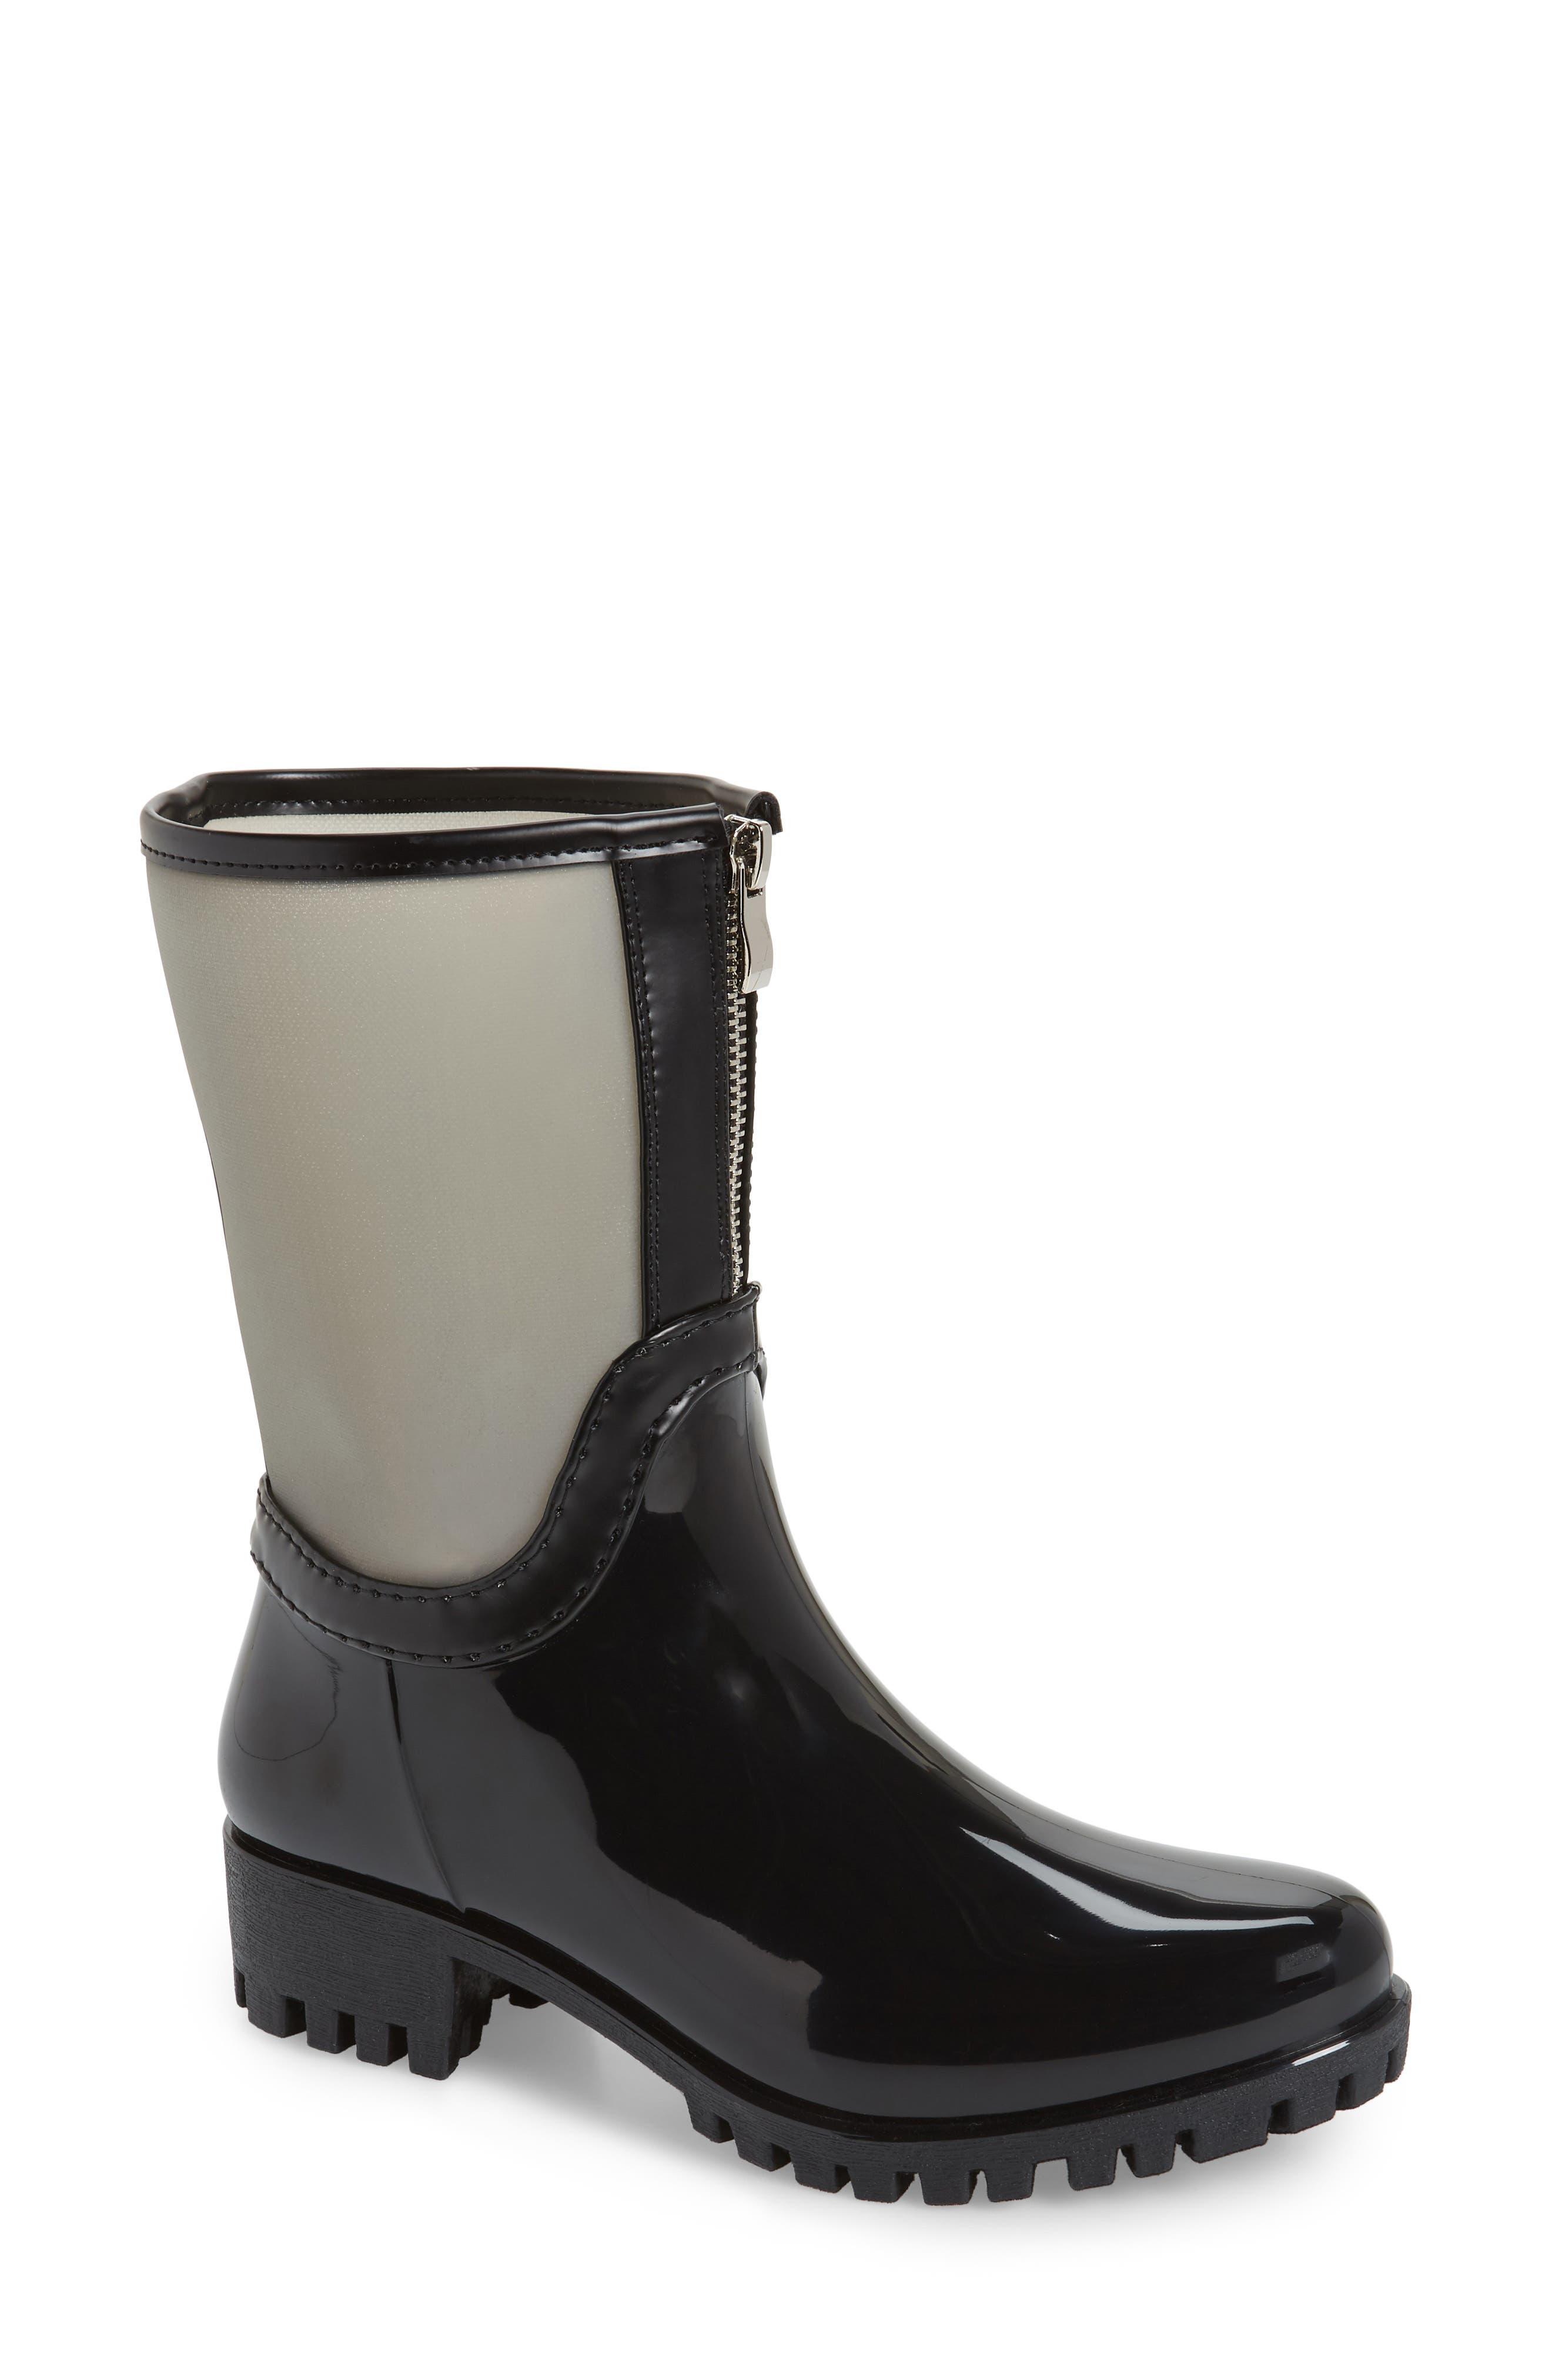 Dryden Sheer Waterproof Boot,                         Main,                         color, GREY FABRIC